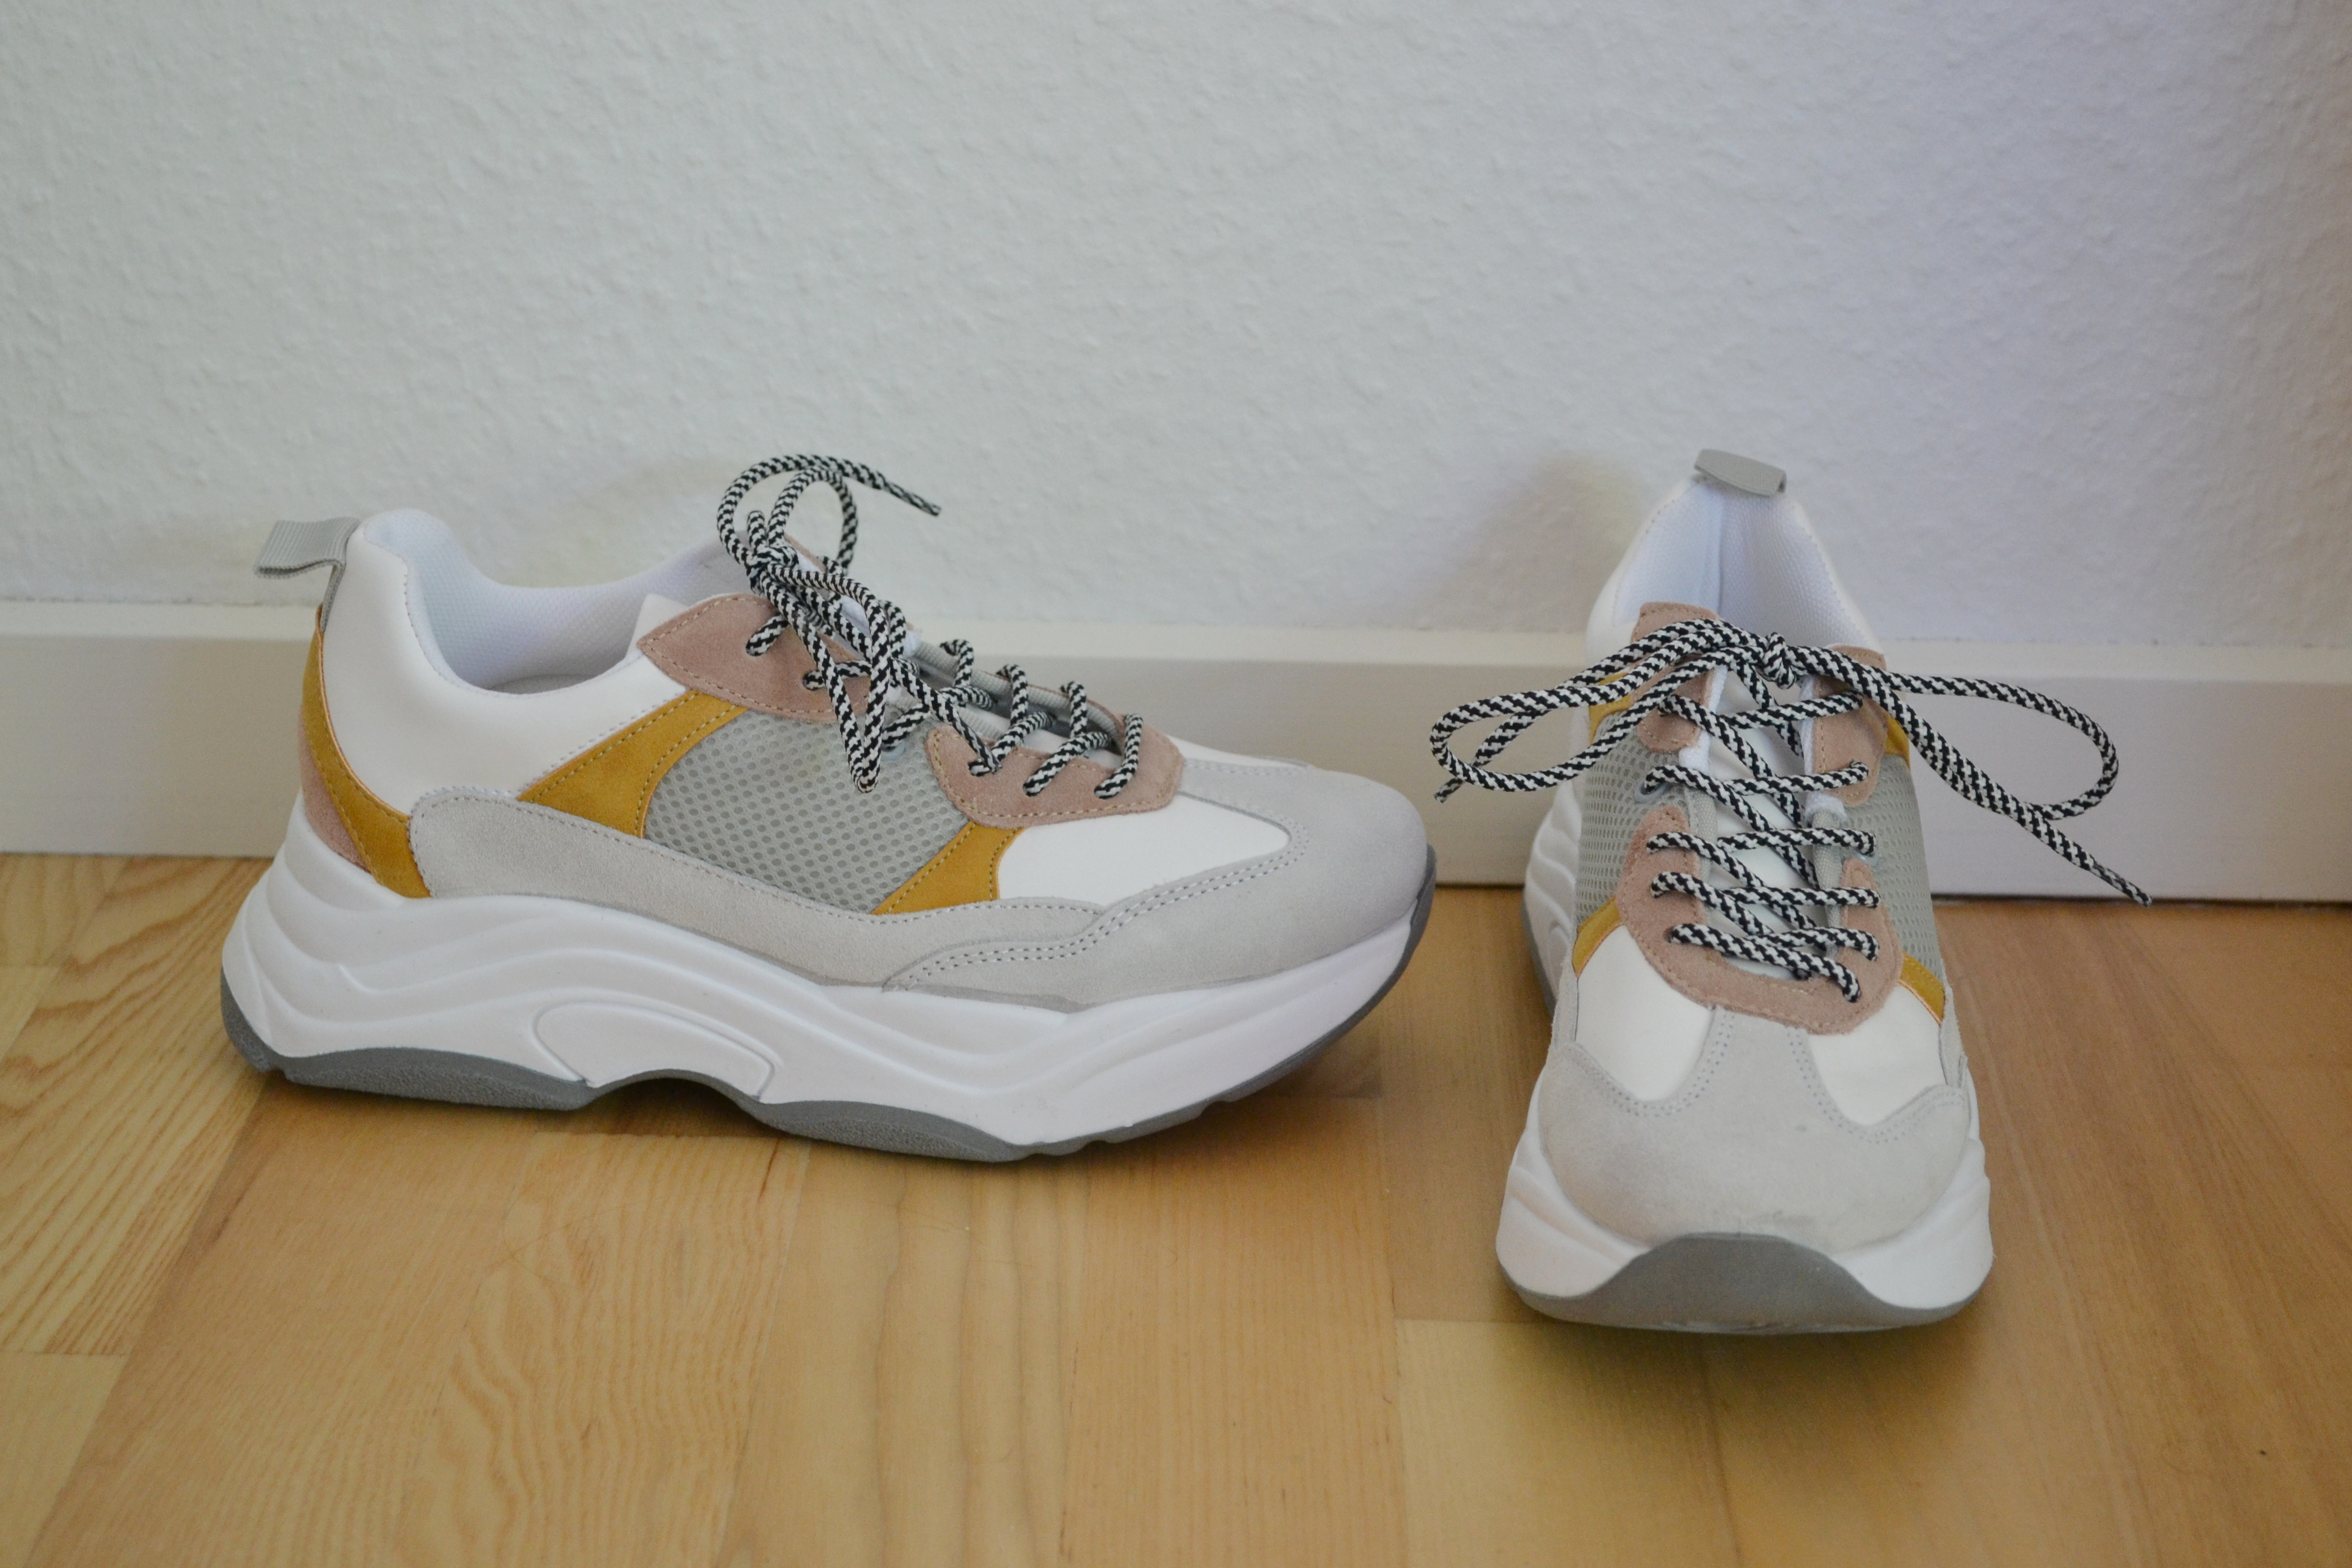 Hvide chunky sneakers m. lyserøde, grå og karrygule detaljer - Topshop